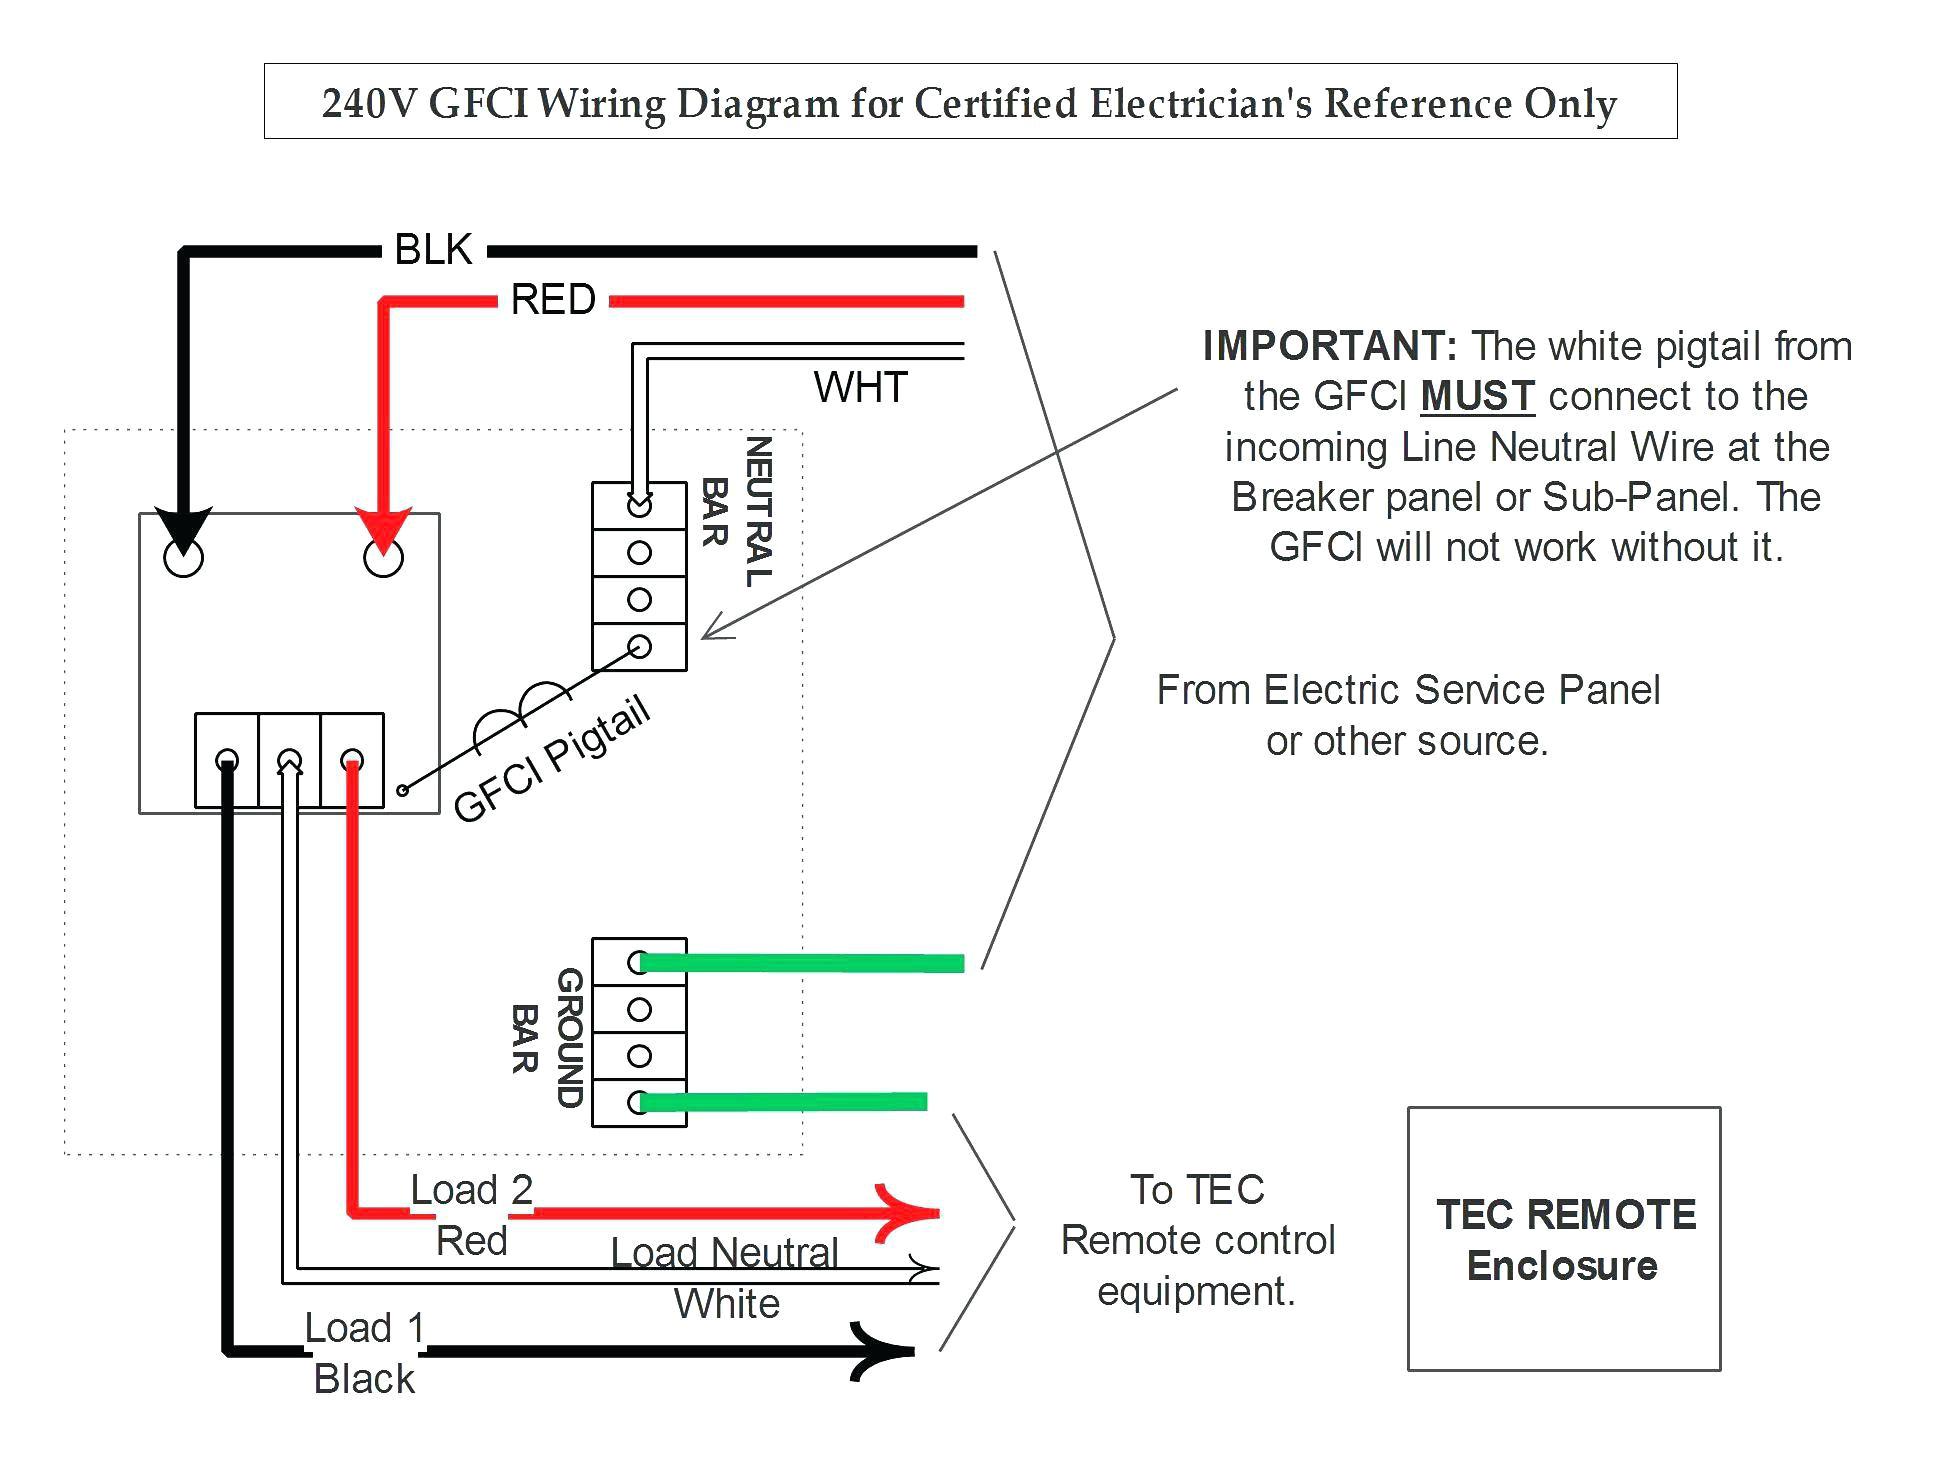 Gfci Wiring Diagram Gfci Wiring Diagram Beautiful Wiring Diagram Amp Gfci Breaker Panel